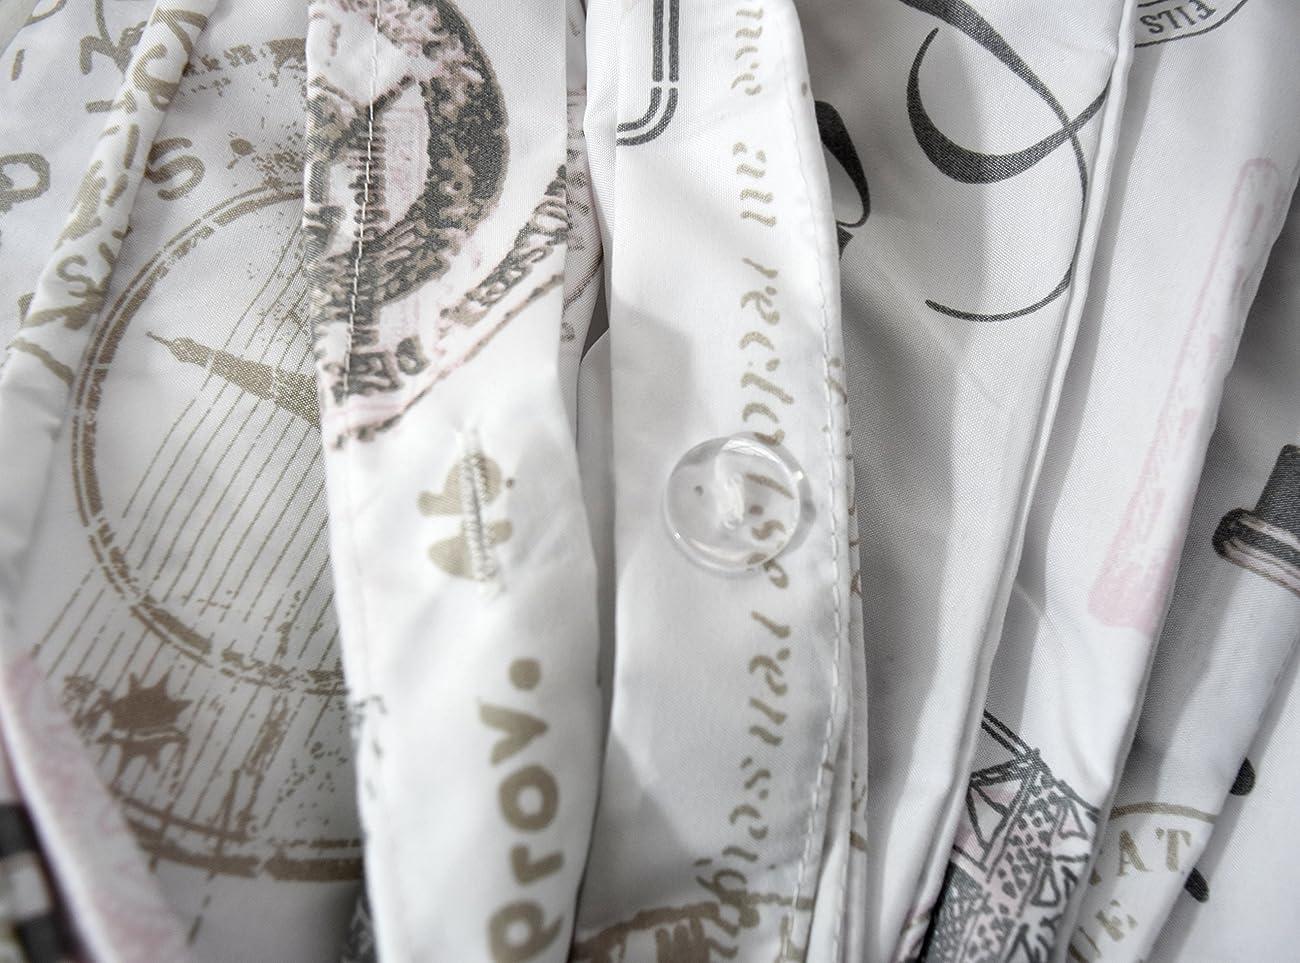 Paris French Vintage Duvet Quilt Cover by Designer Nicole Miller, Bedding Set Grey Tan Dusty Rose Pink Eiffel Script Parisian Theme on White (Queen) 3